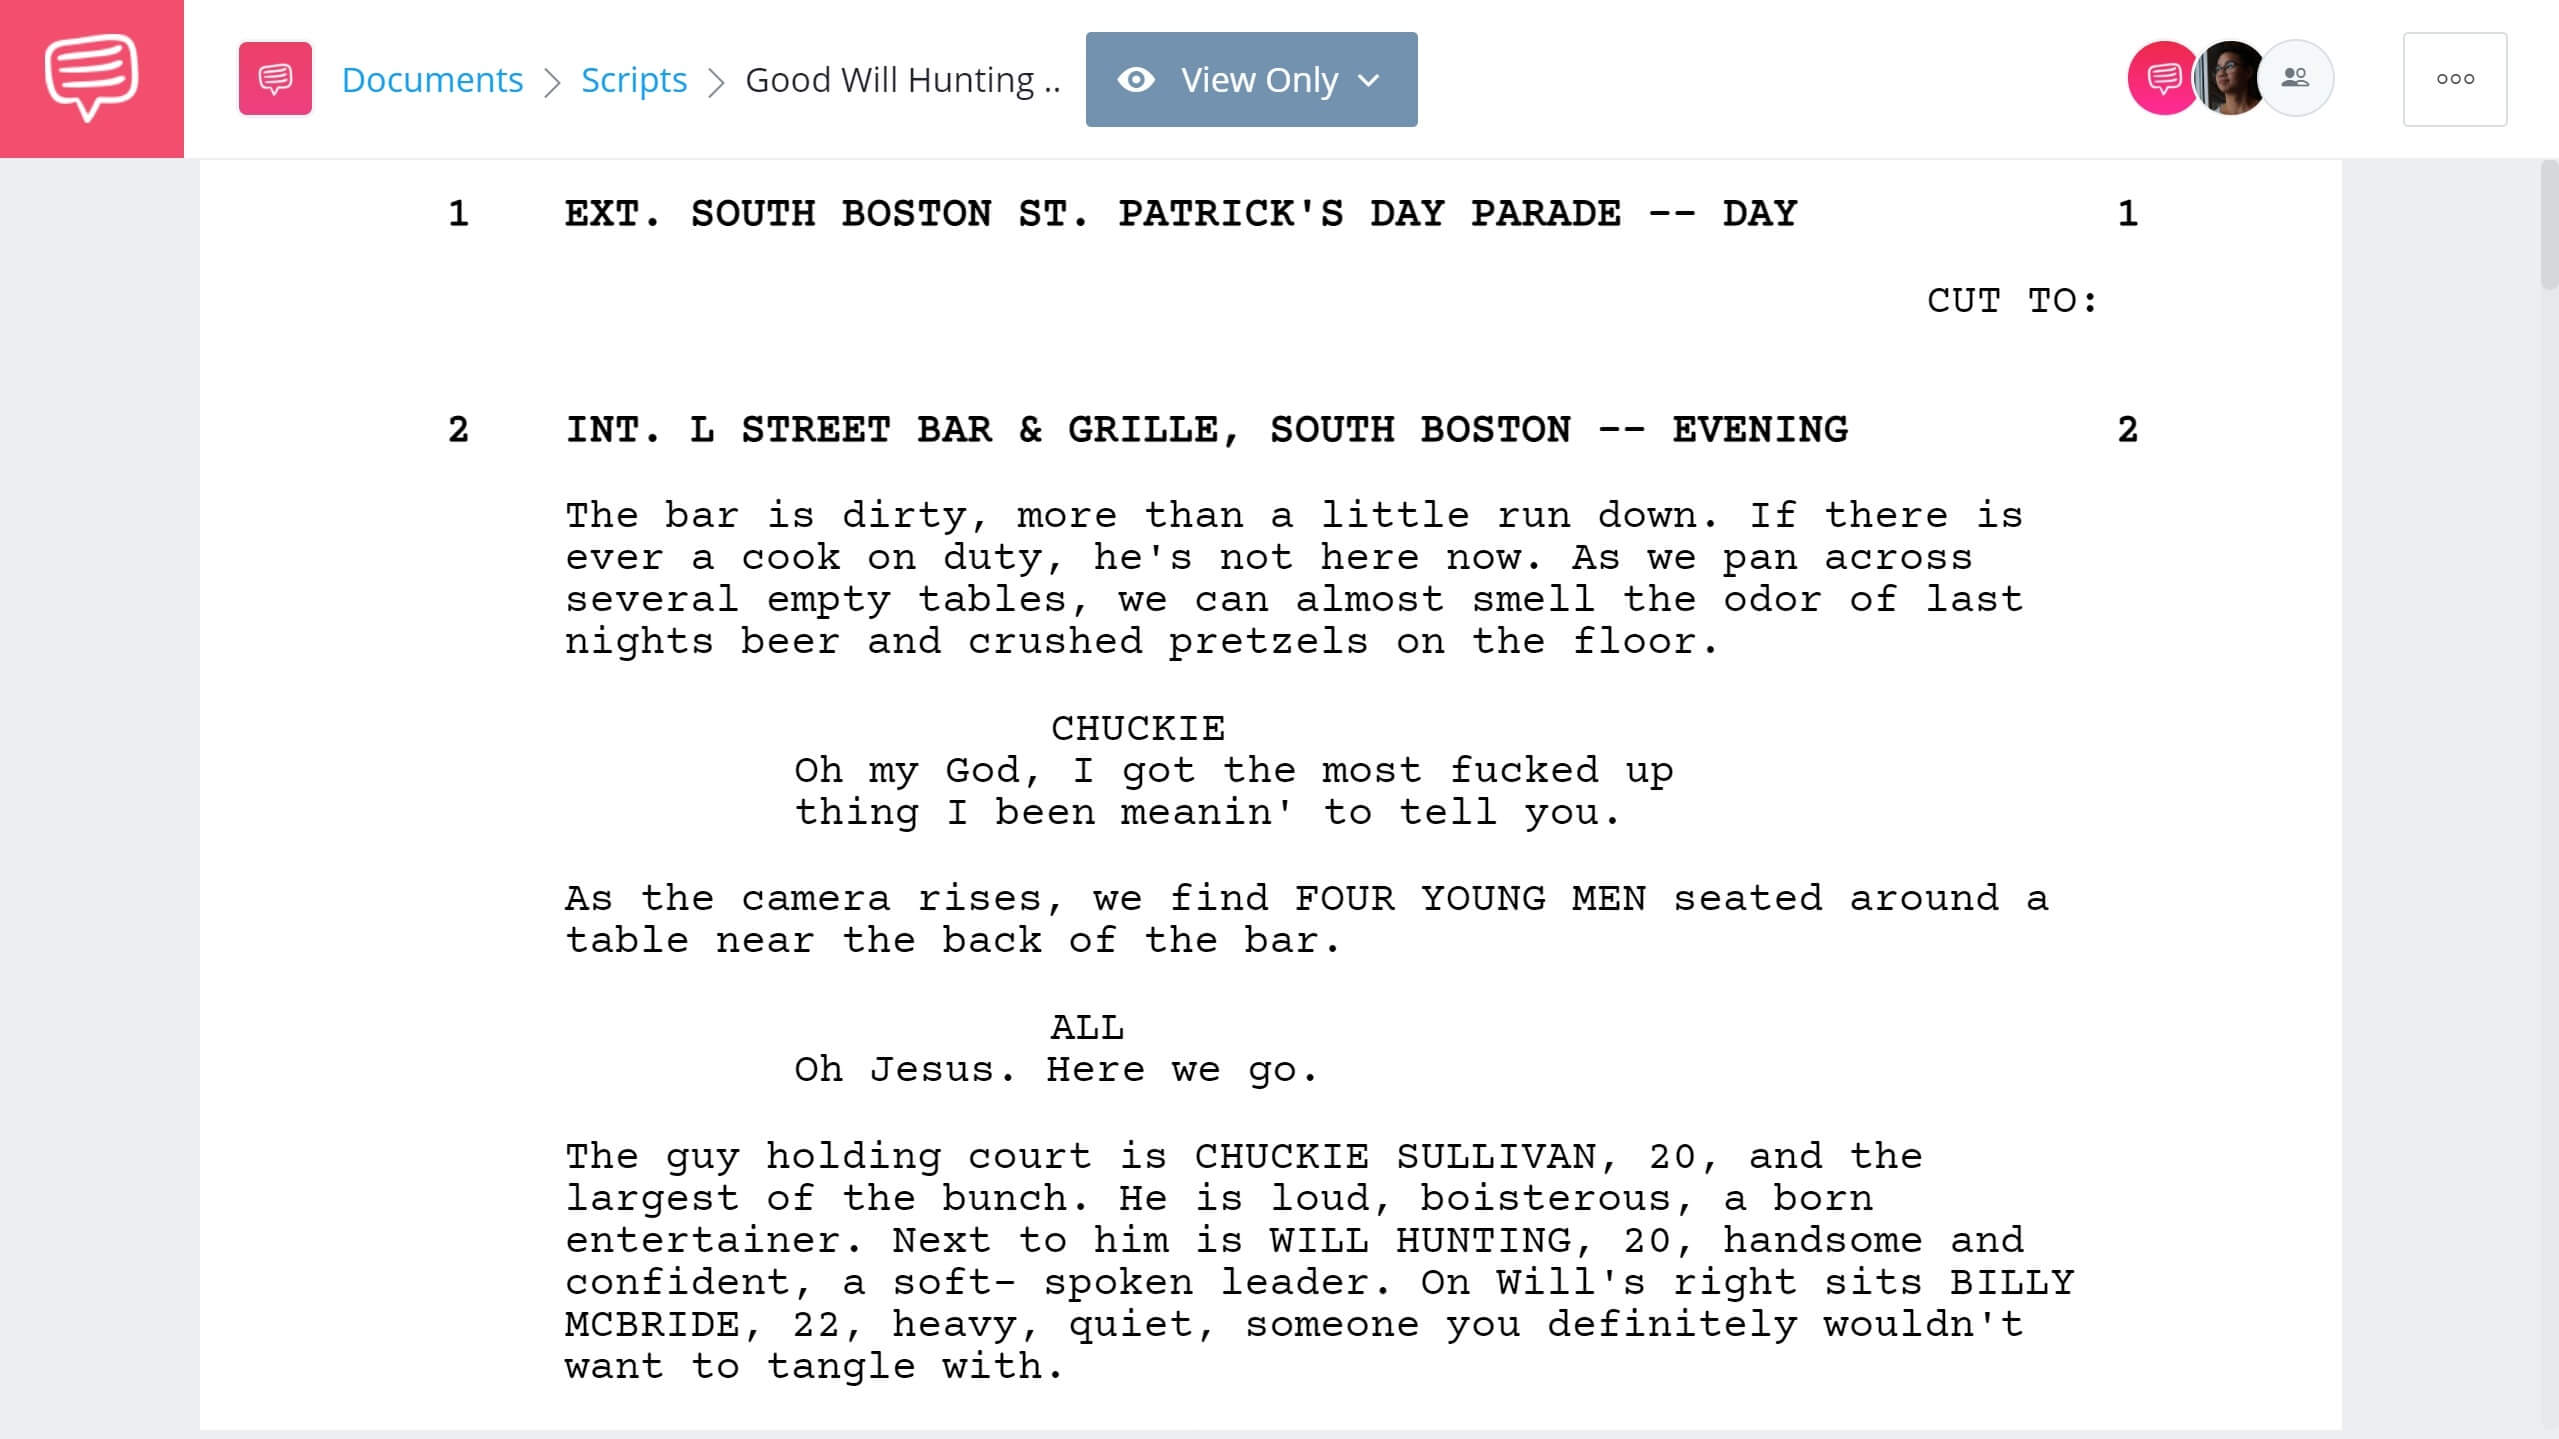 Best Original Screenplay Academy Award - Good Will Hunting Full Script PDF Download - StudioBinder Screenwriting Software